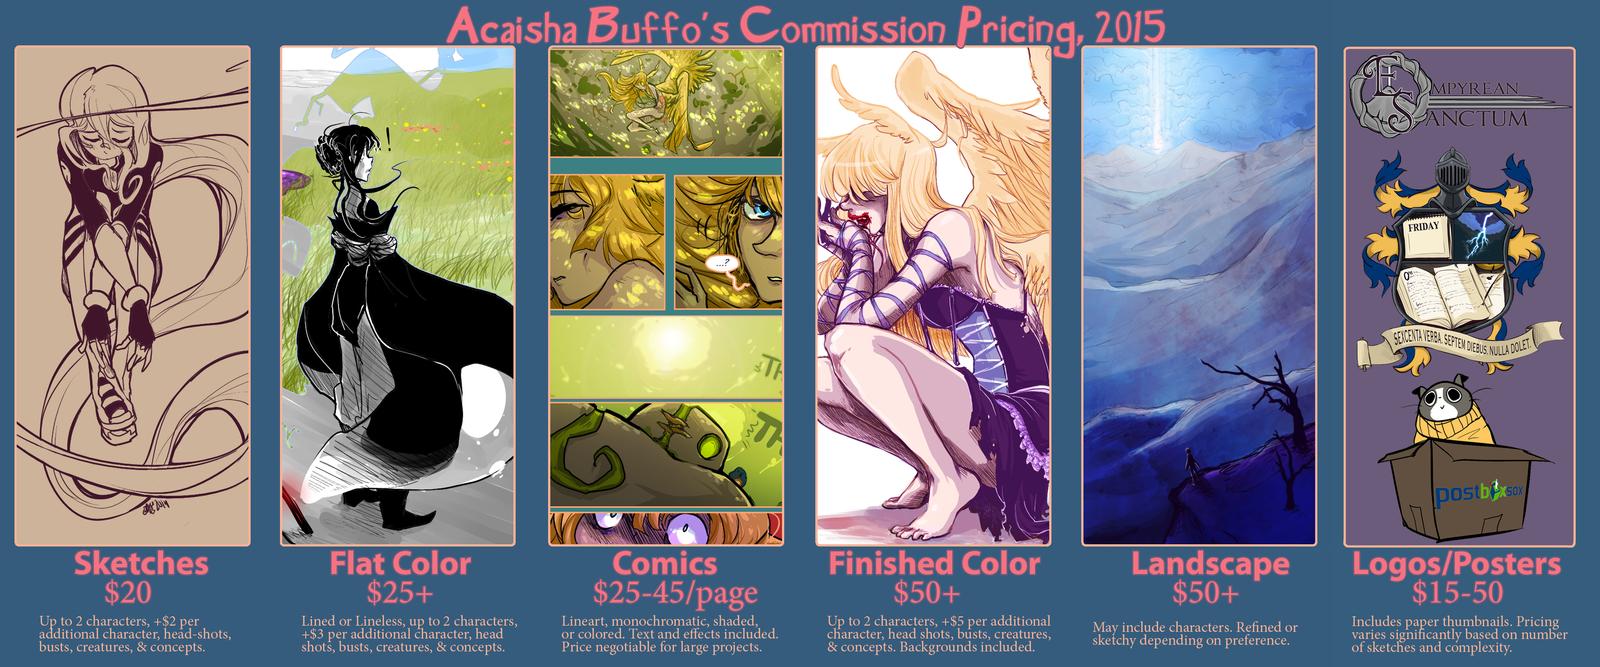 AkitheFrivolicious' Commission Pricing Chart, 2015 by AkitheFrivolicious